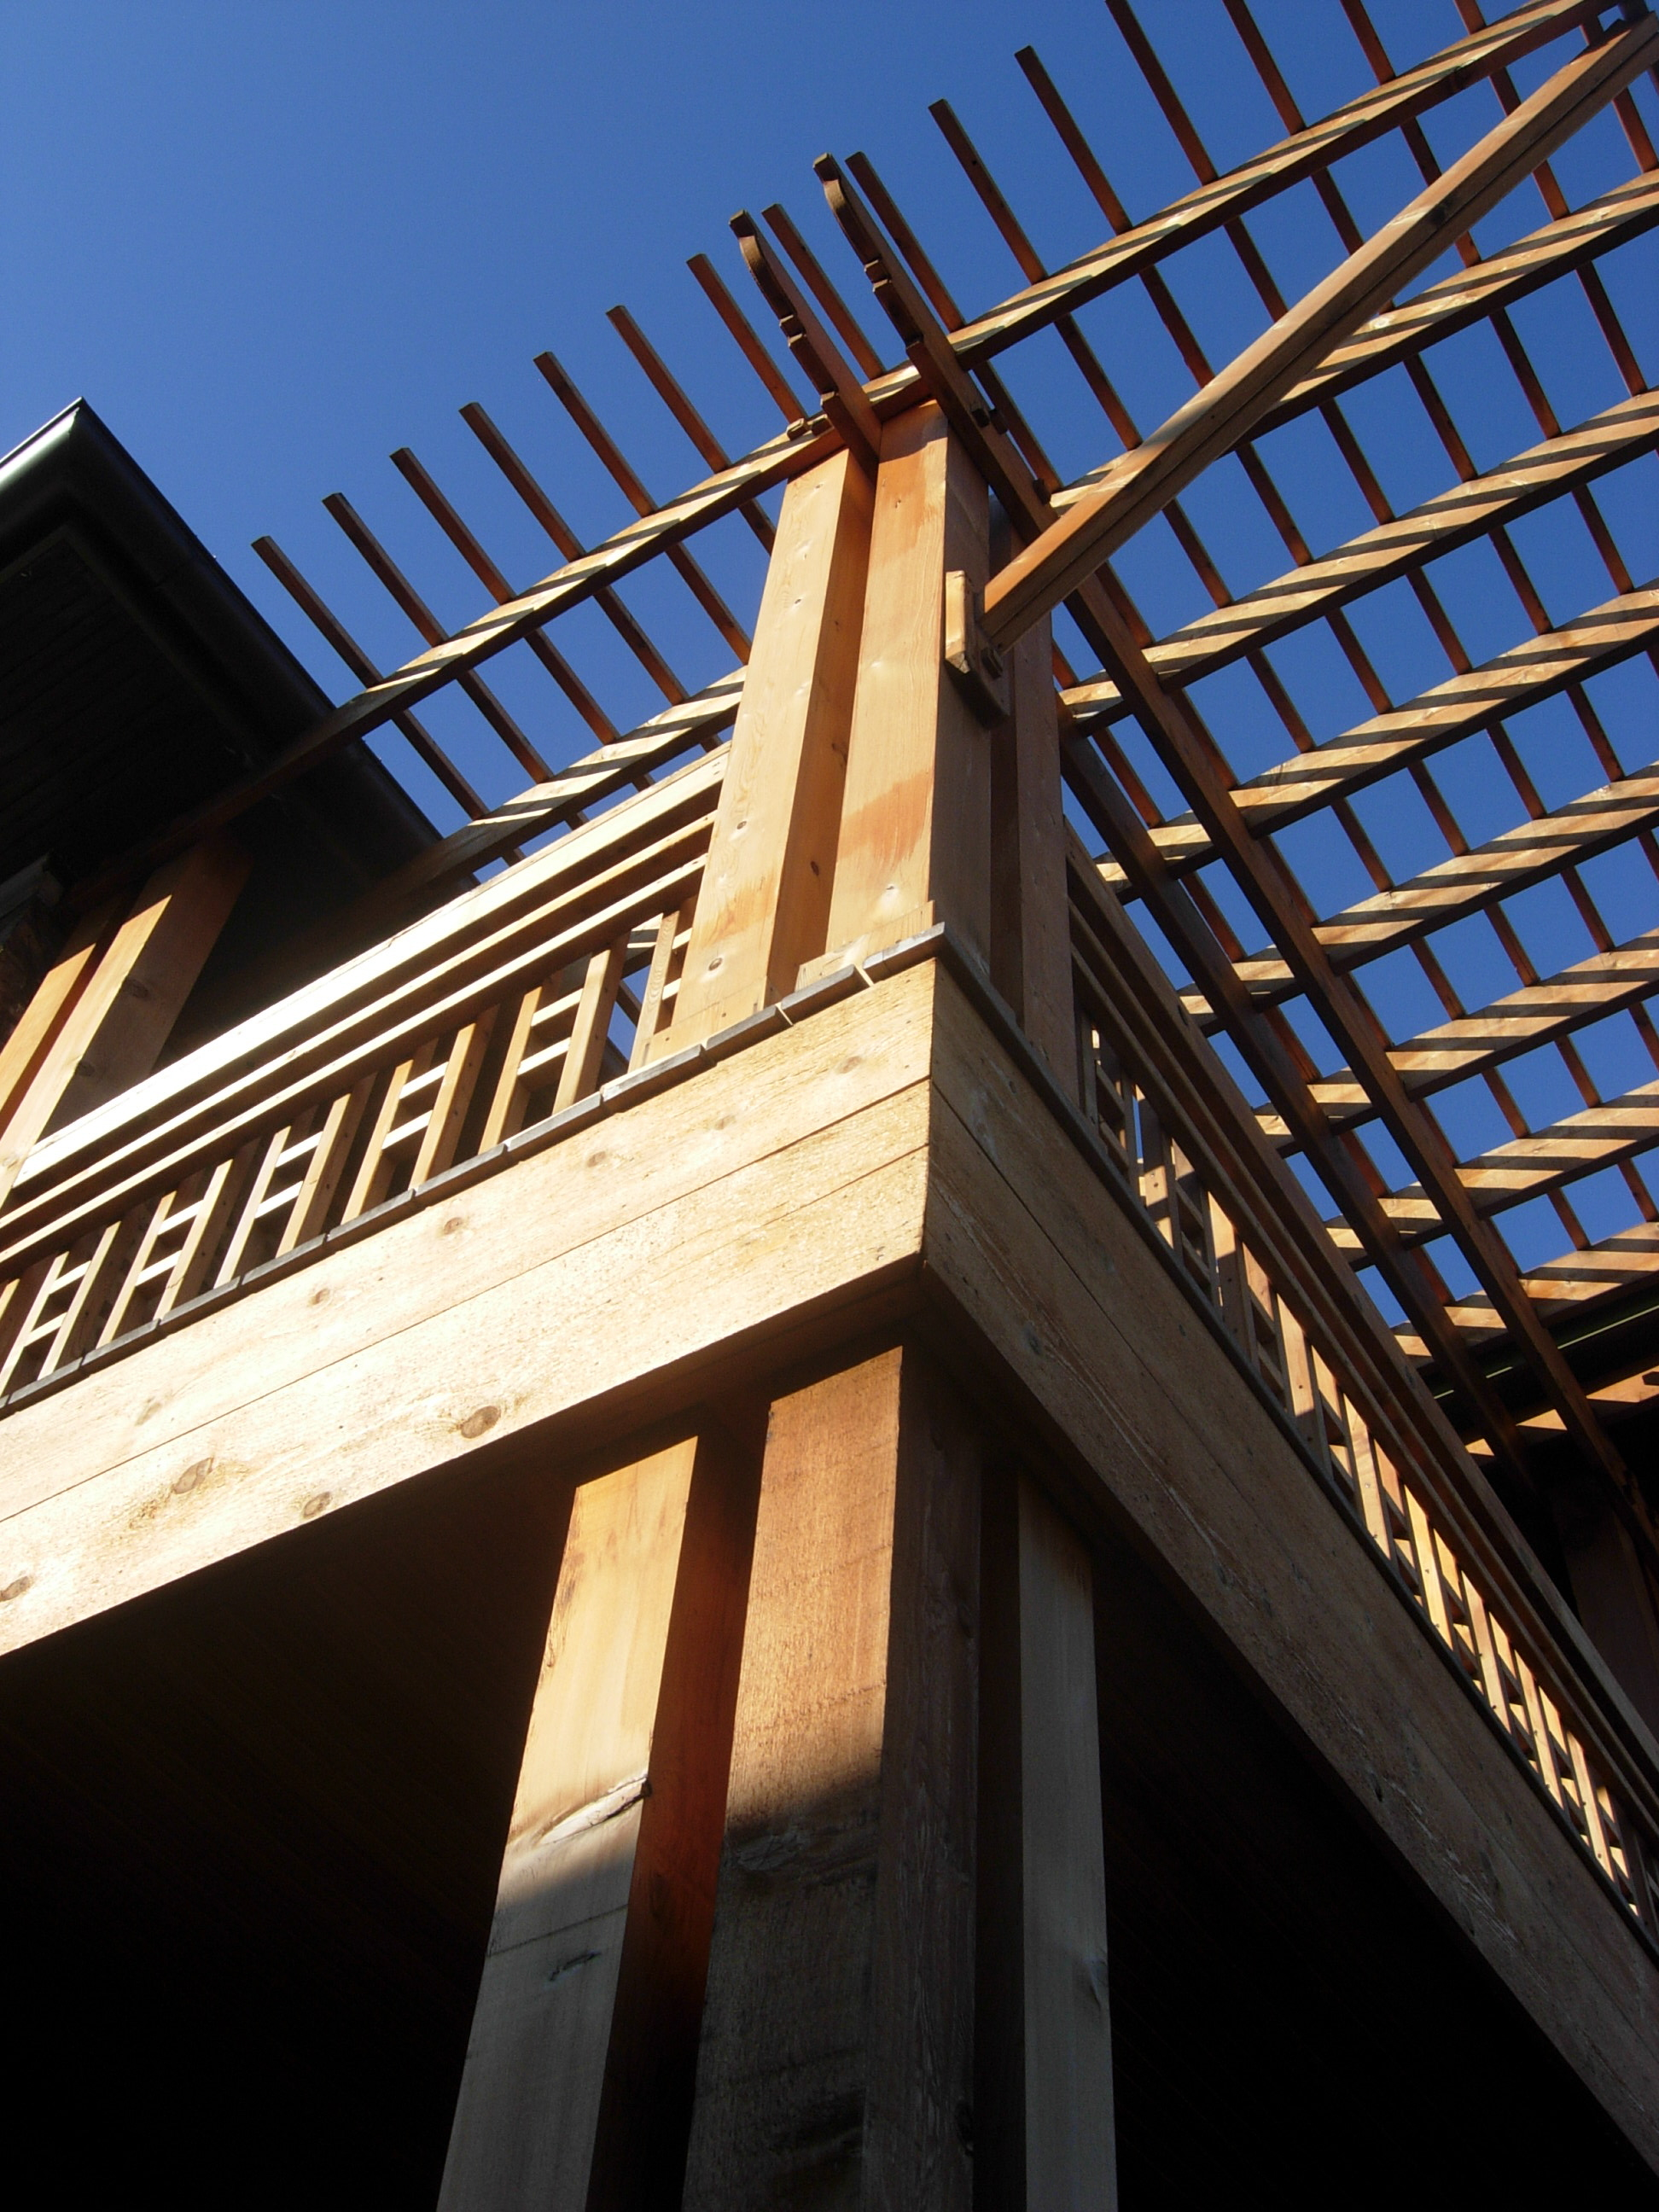 10-Laedkte Porch p10.jpg